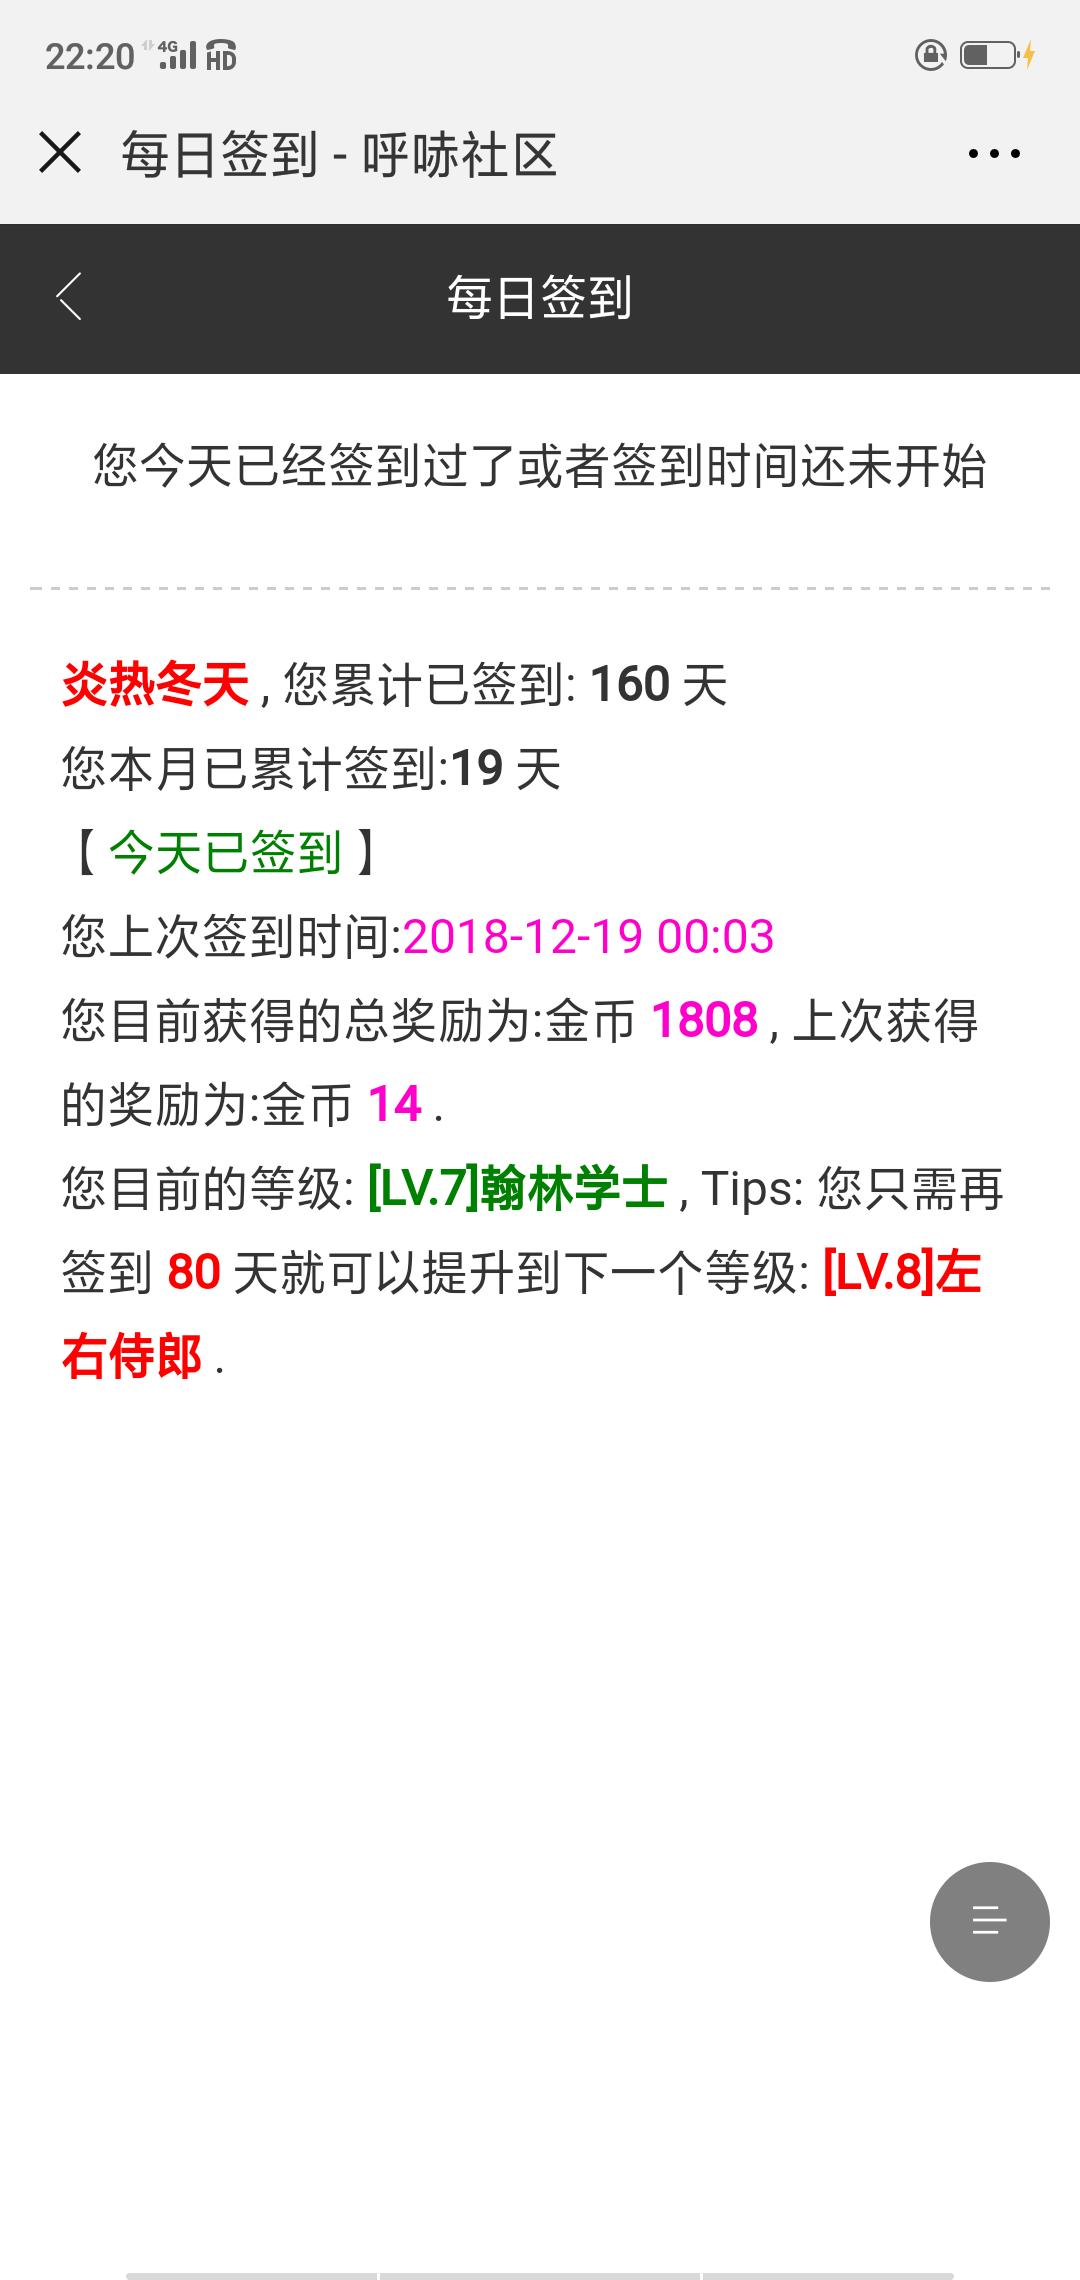 Screenshot_2018-12-19-22-20-05-75.png